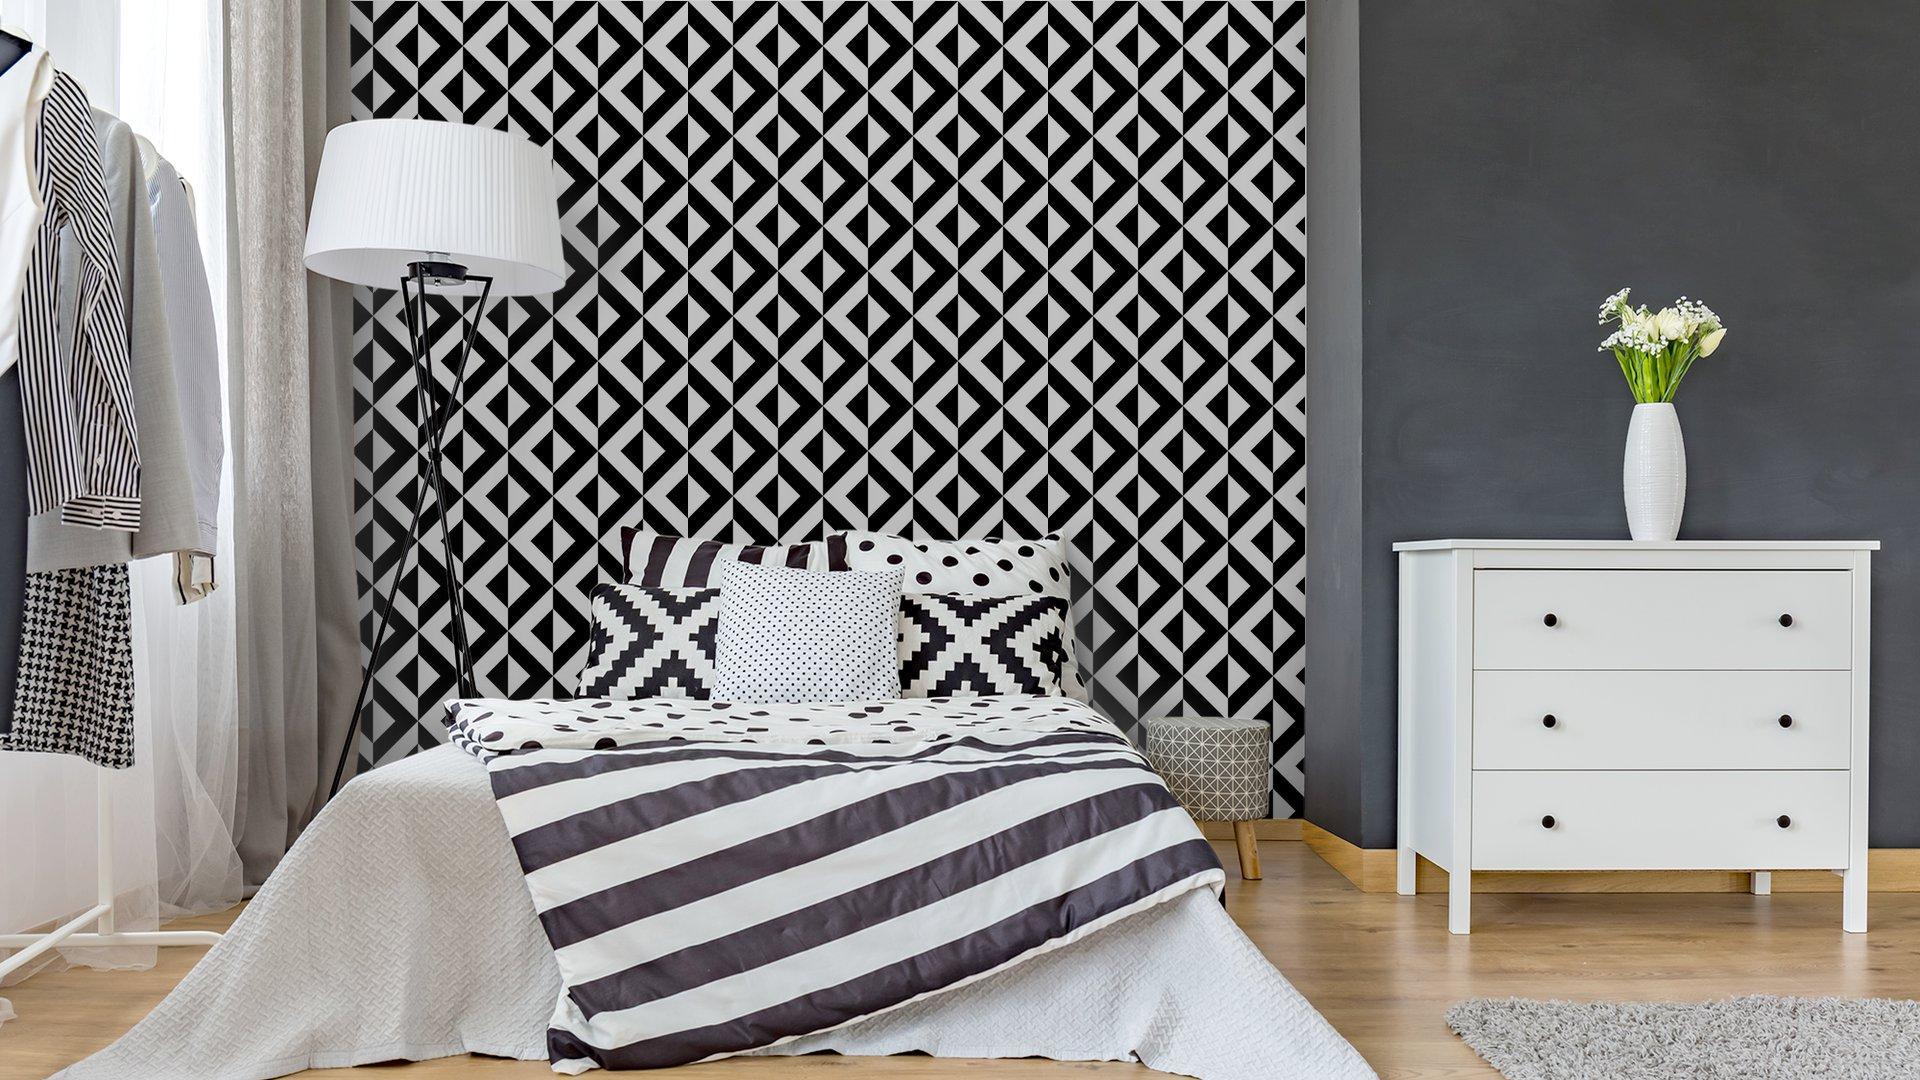 Fotomurales mexico papeles pintados patron geometrico abstracto 4 - Papel Tapiz Geométrico Blanco y Negro 01